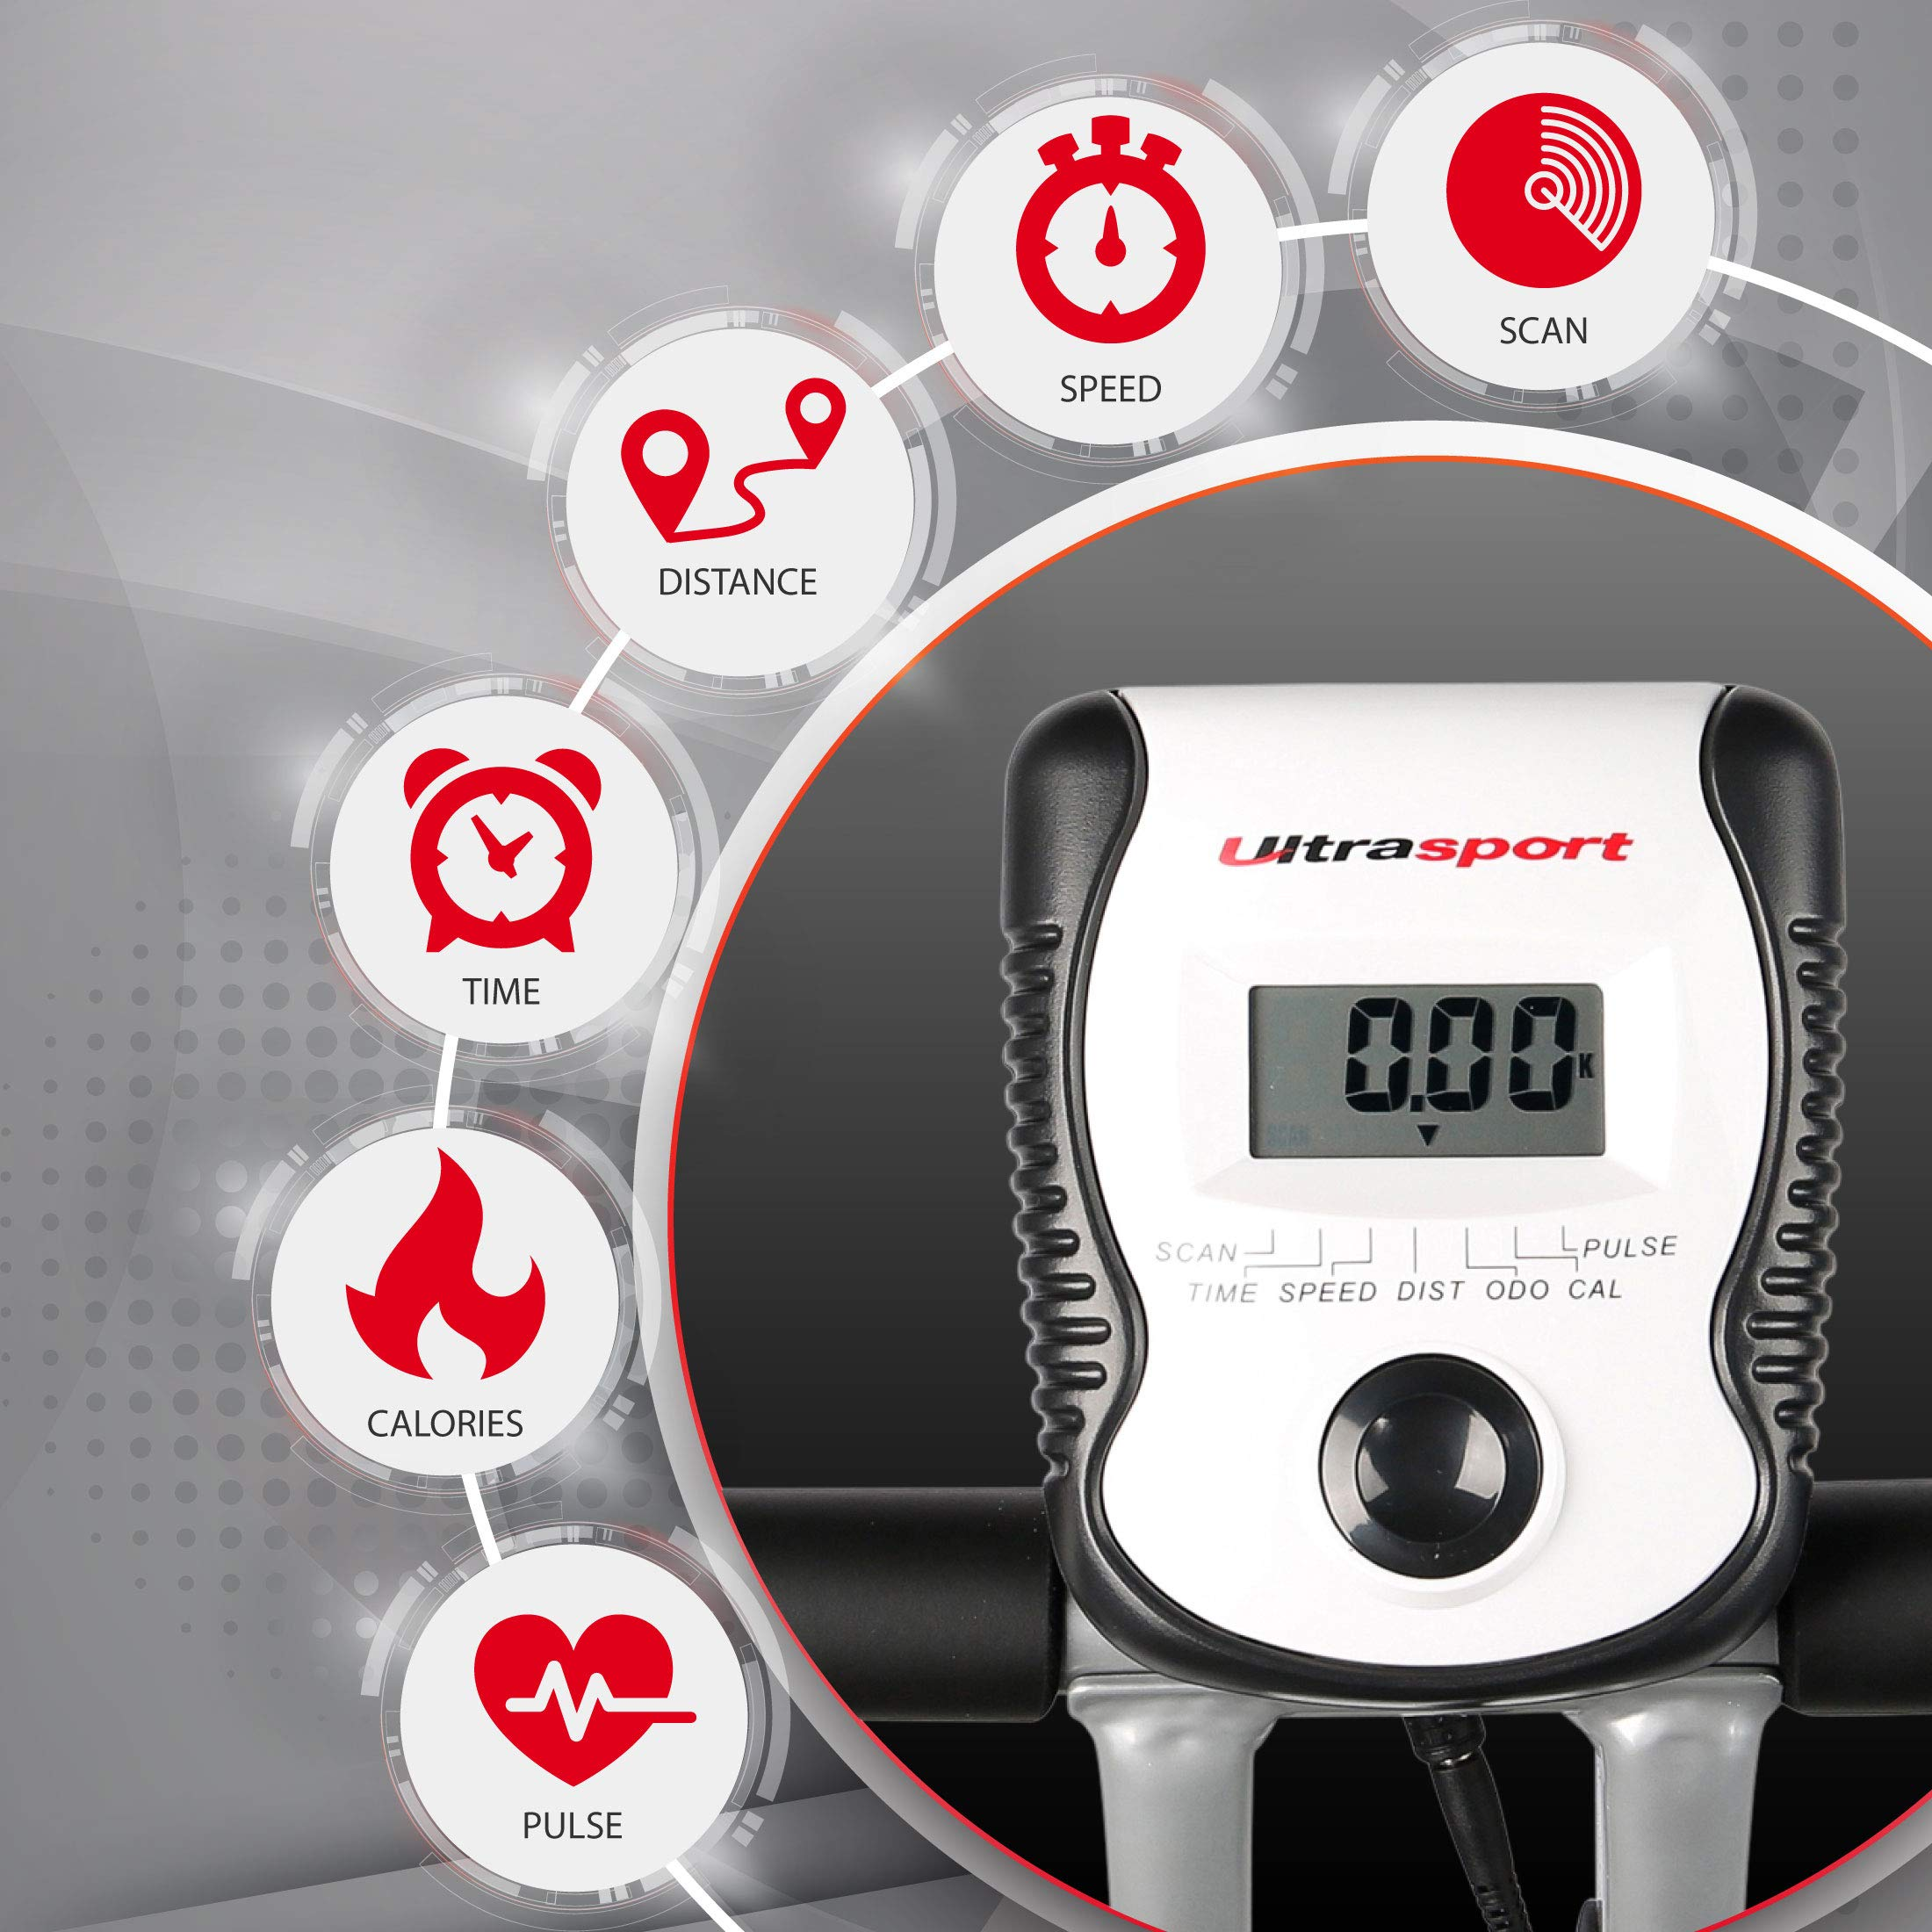 Ultrasport F-Bike 200B Bicicleta estática con sensores de pulso de ...